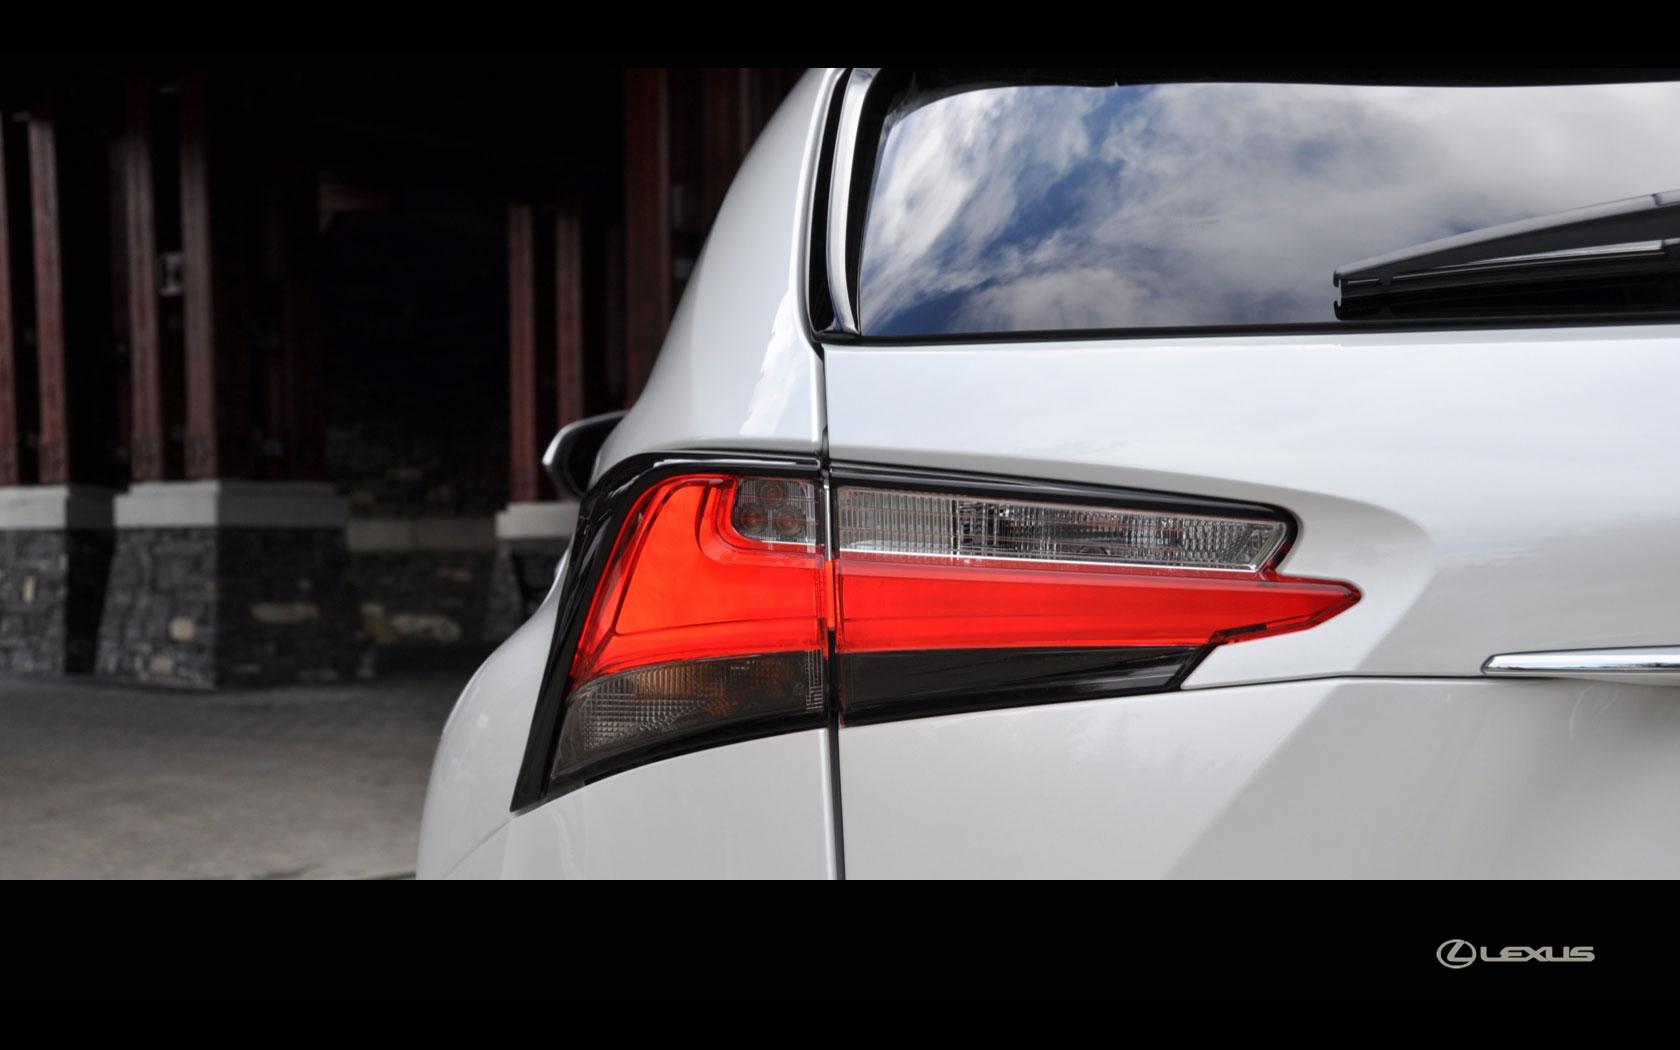 Lexus Nx Rear Tail Lamp